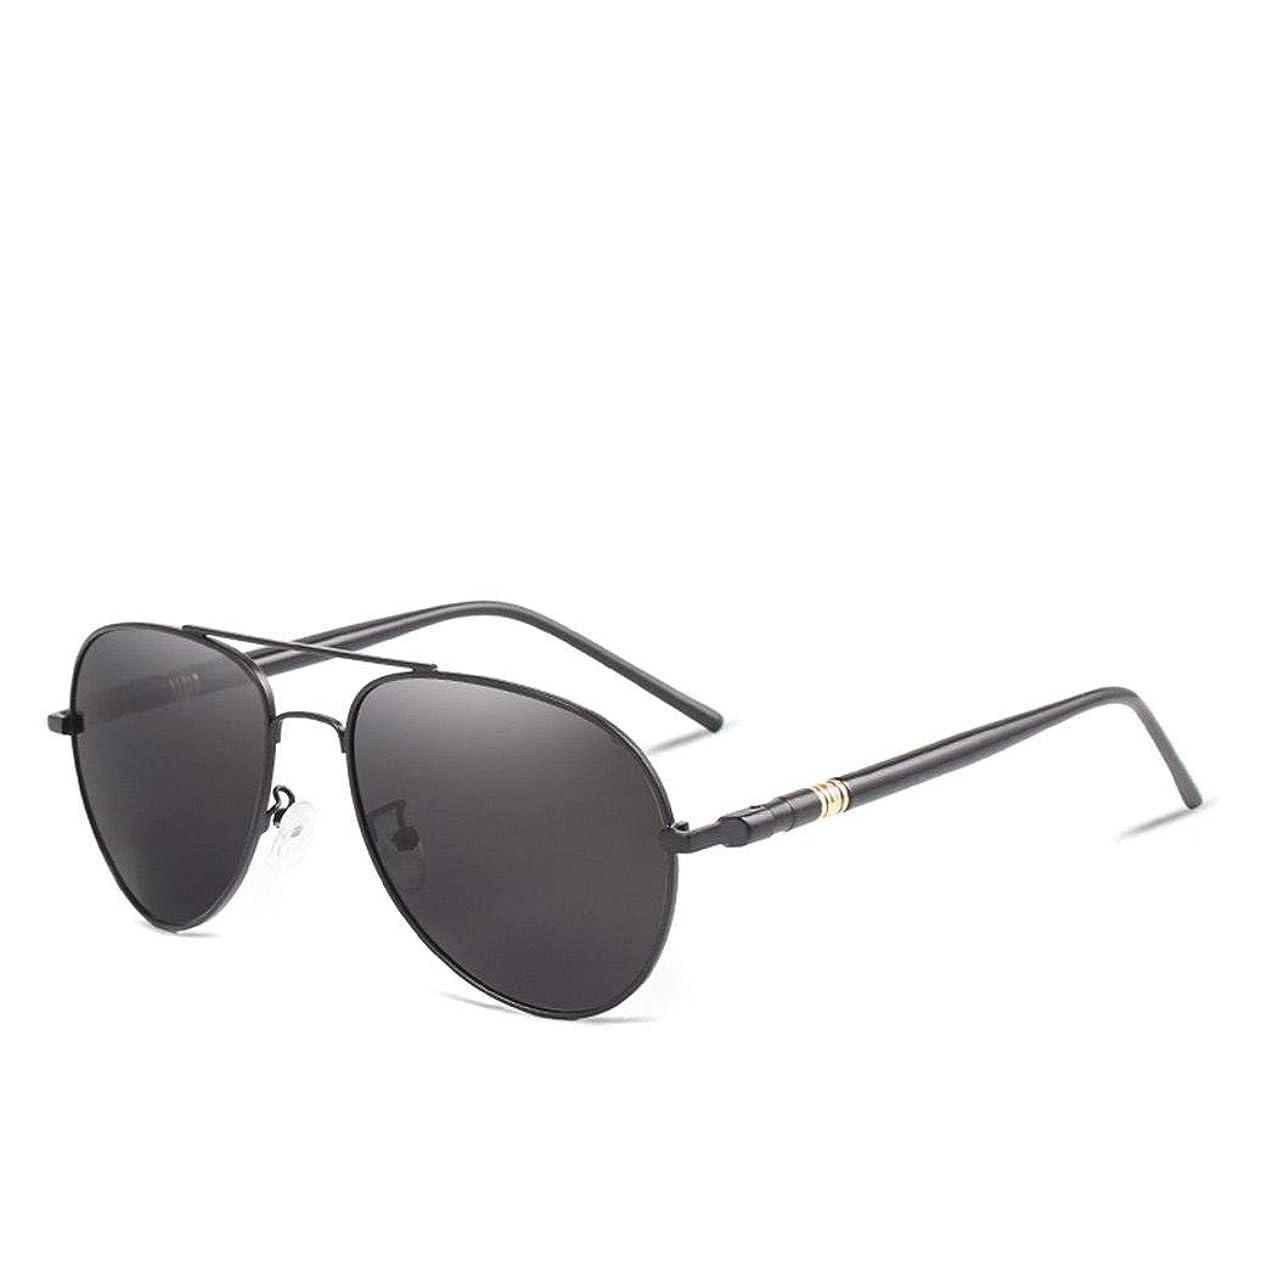 Sunglasses Men Polarized Driving Sun Glasses Eyewear Male Sunglasses BLAK GRAY